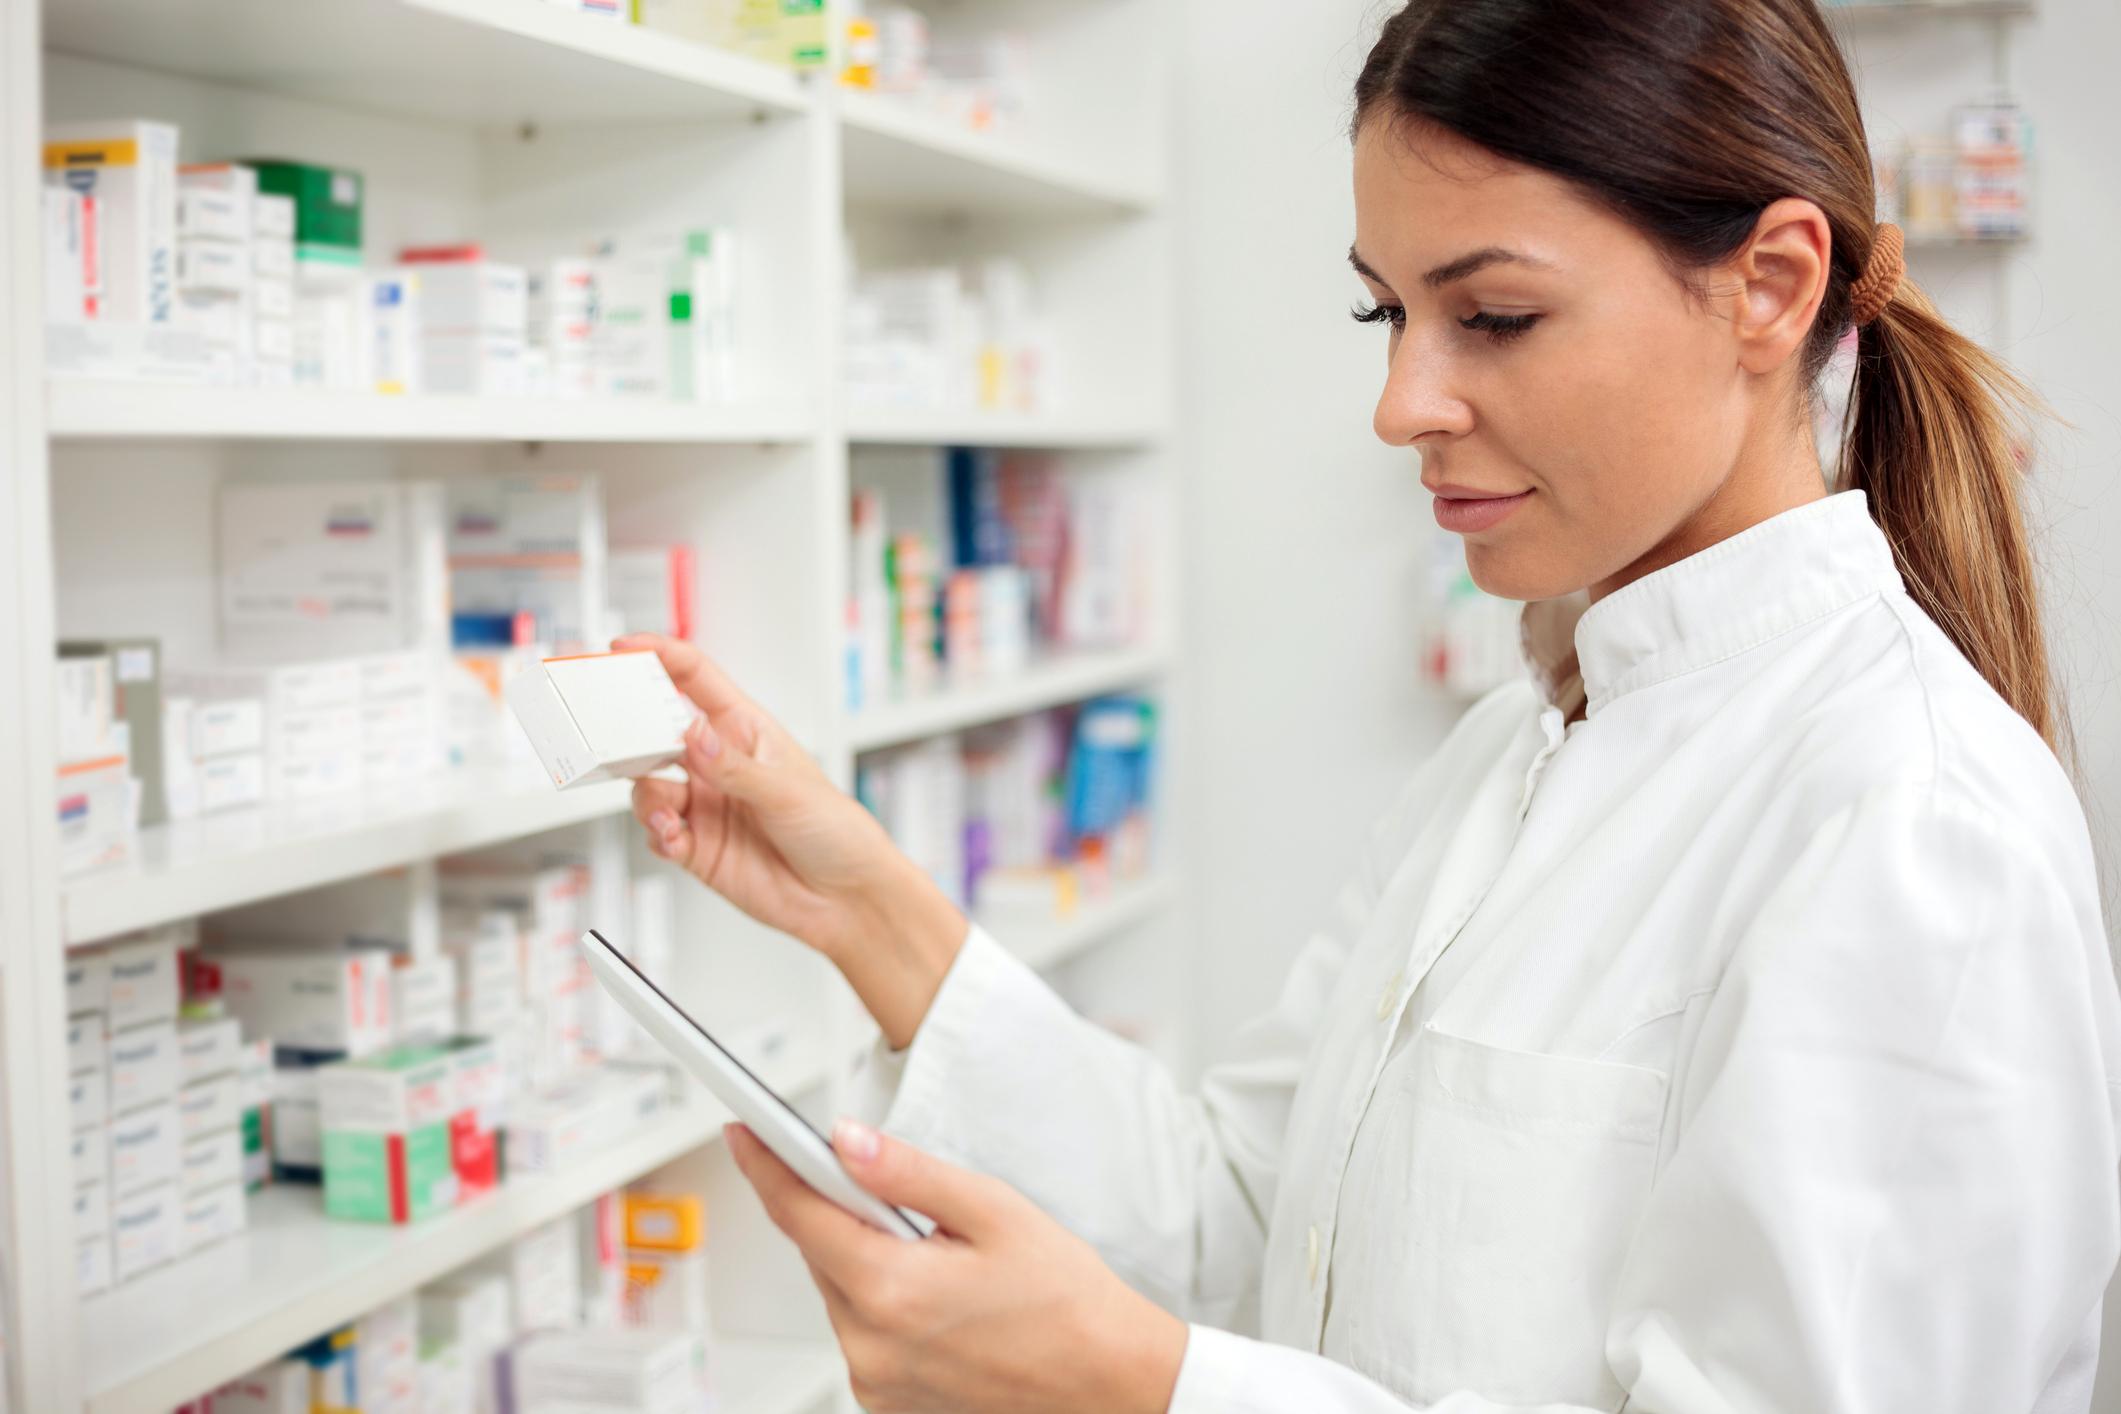 Female pharmacist takes drugs off a shelf